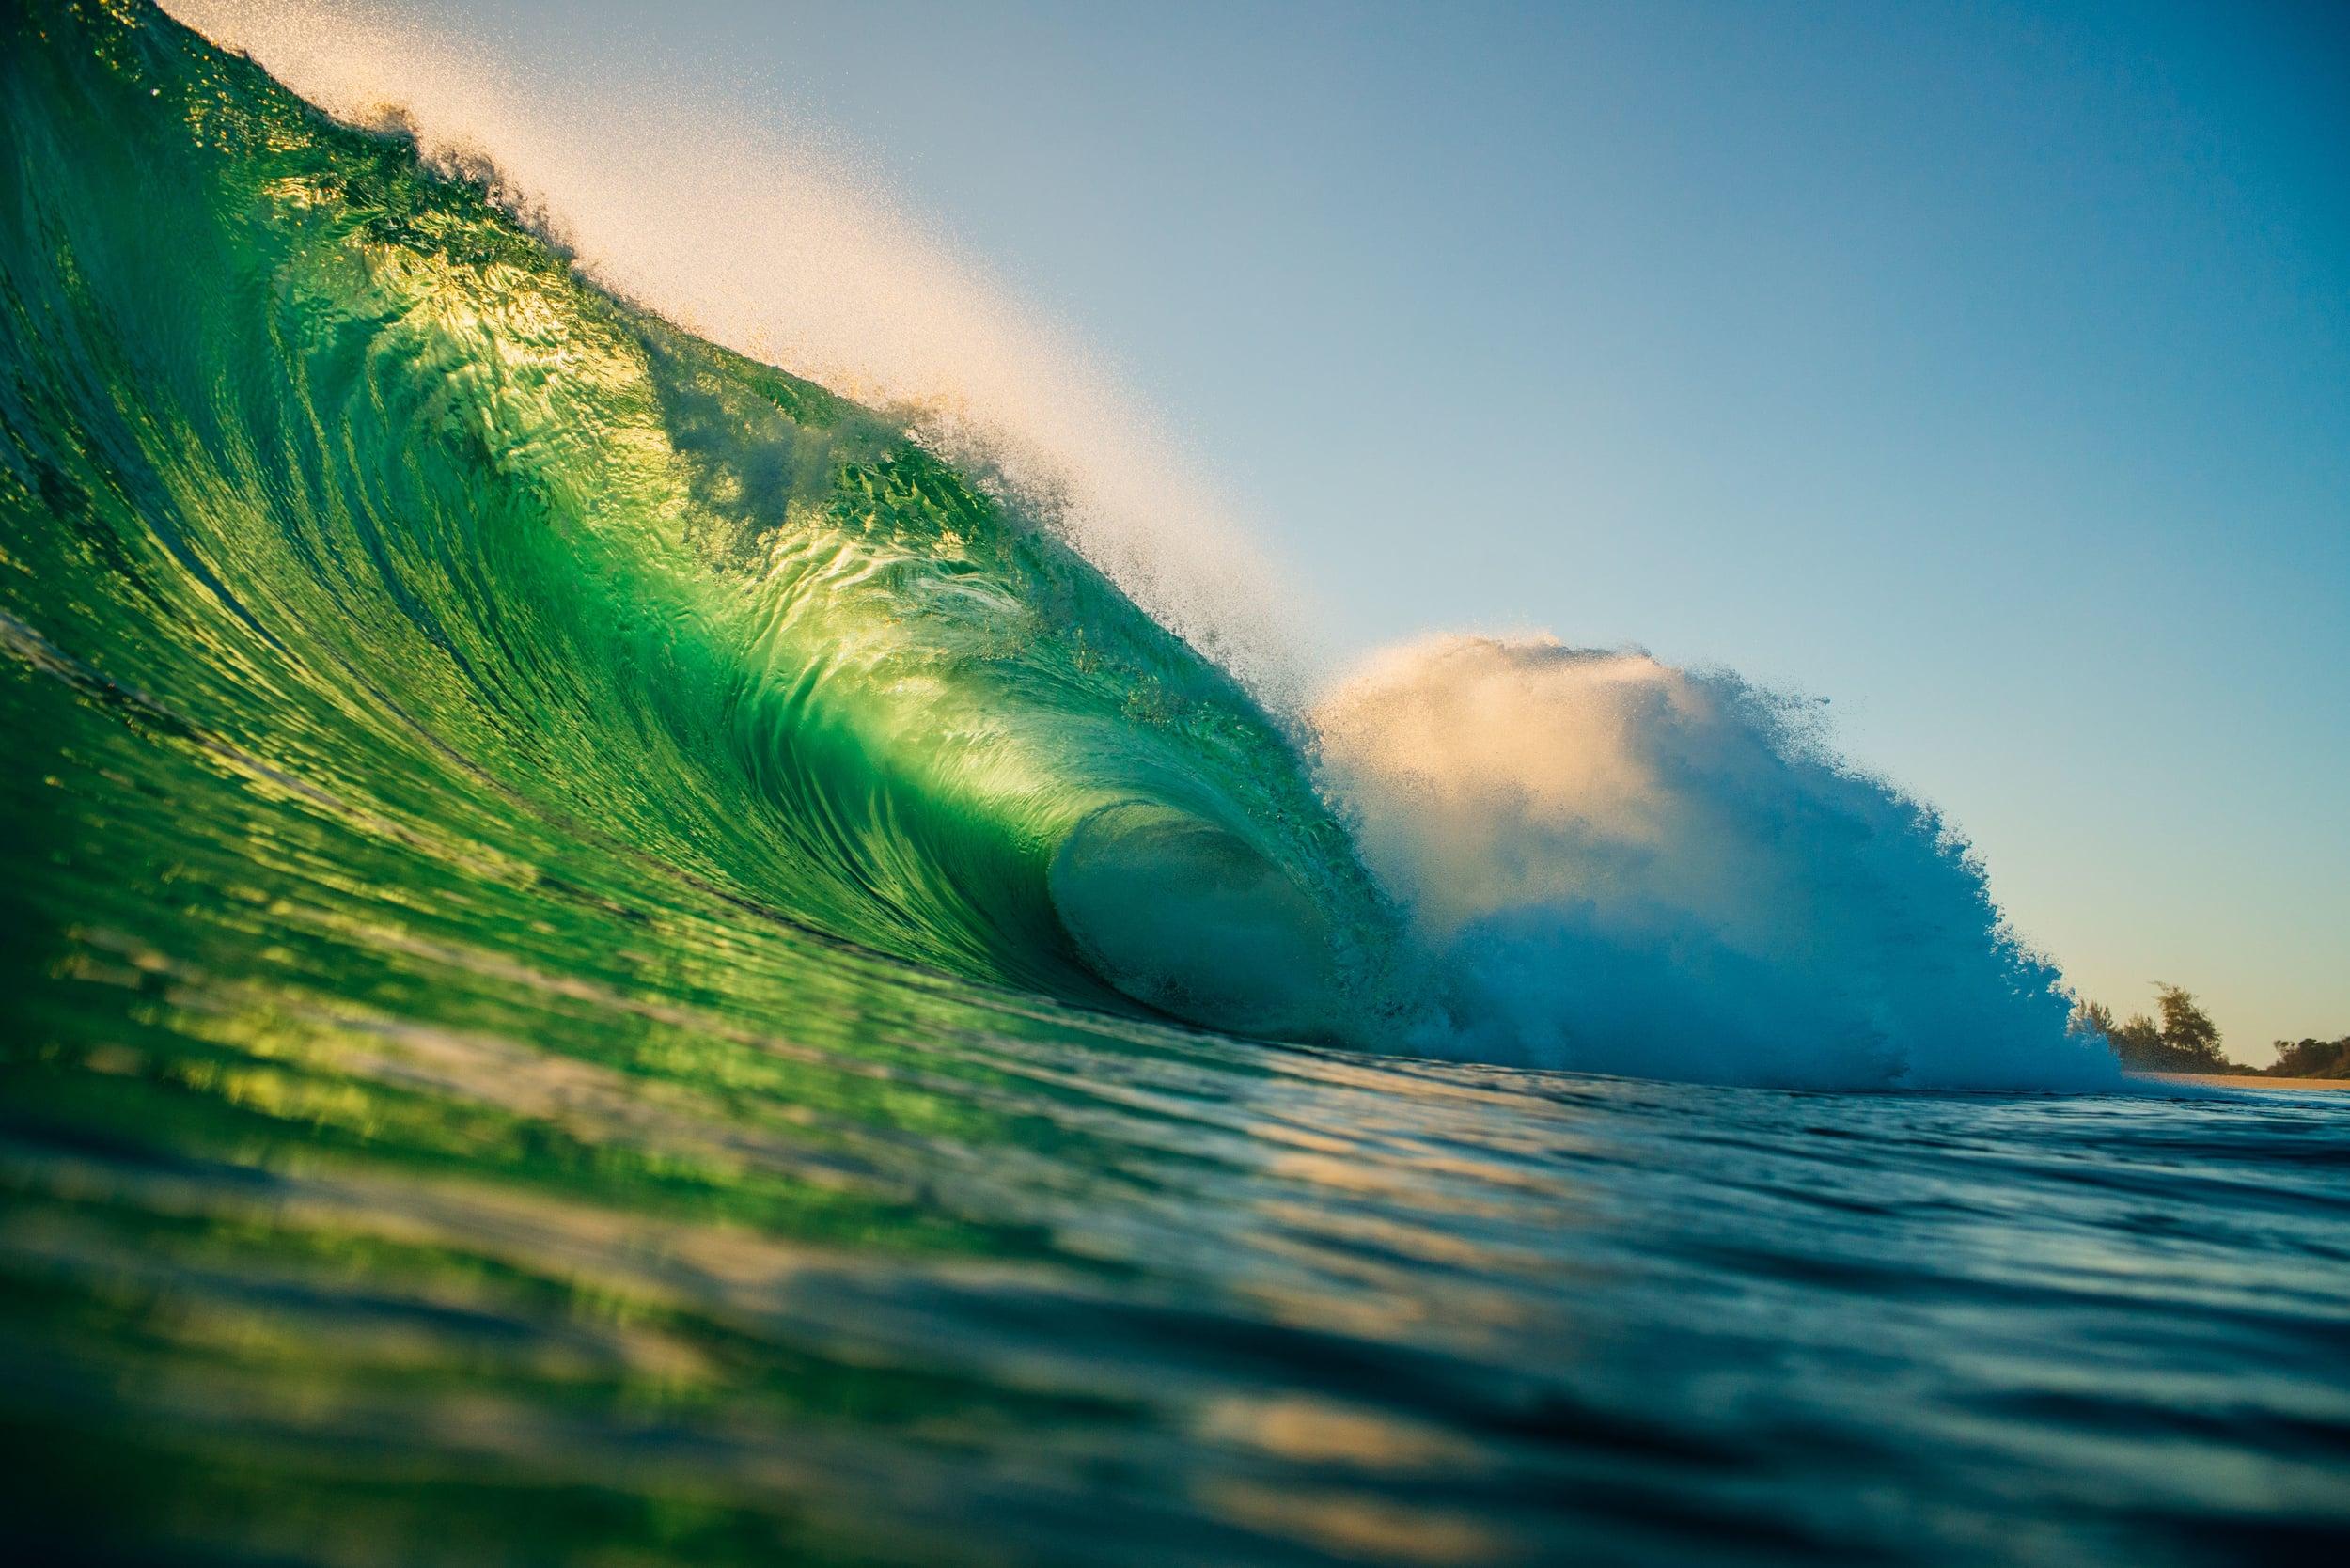 bryce-johnson-photography-kauai-hawaii-surfing-a7rii-aquatech-water-ocean-4.jpg